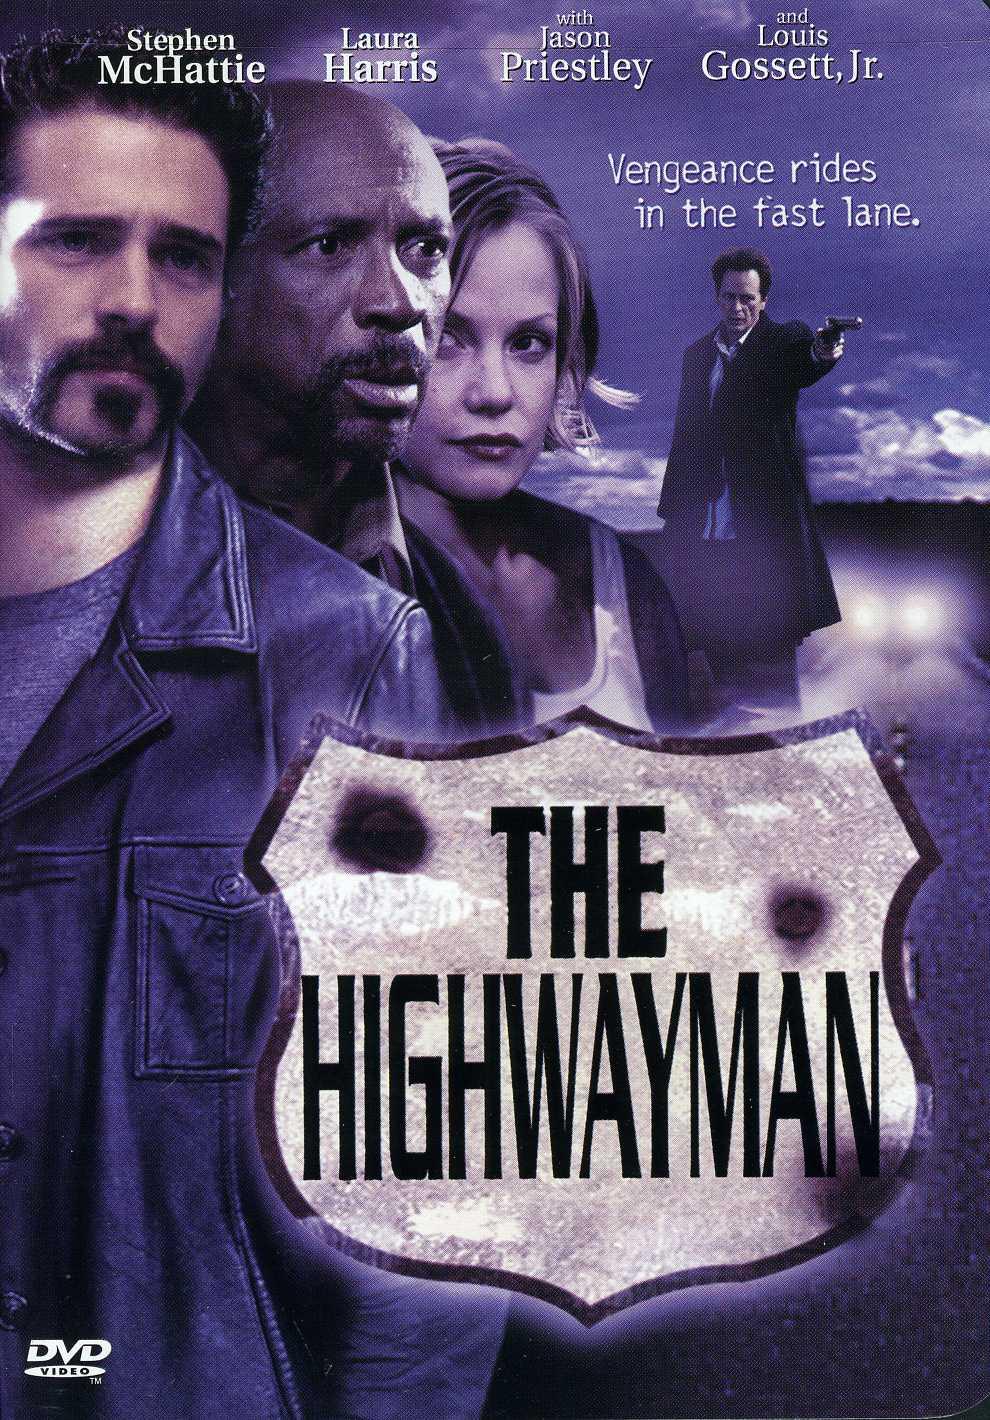 The Highwayman (DVD)